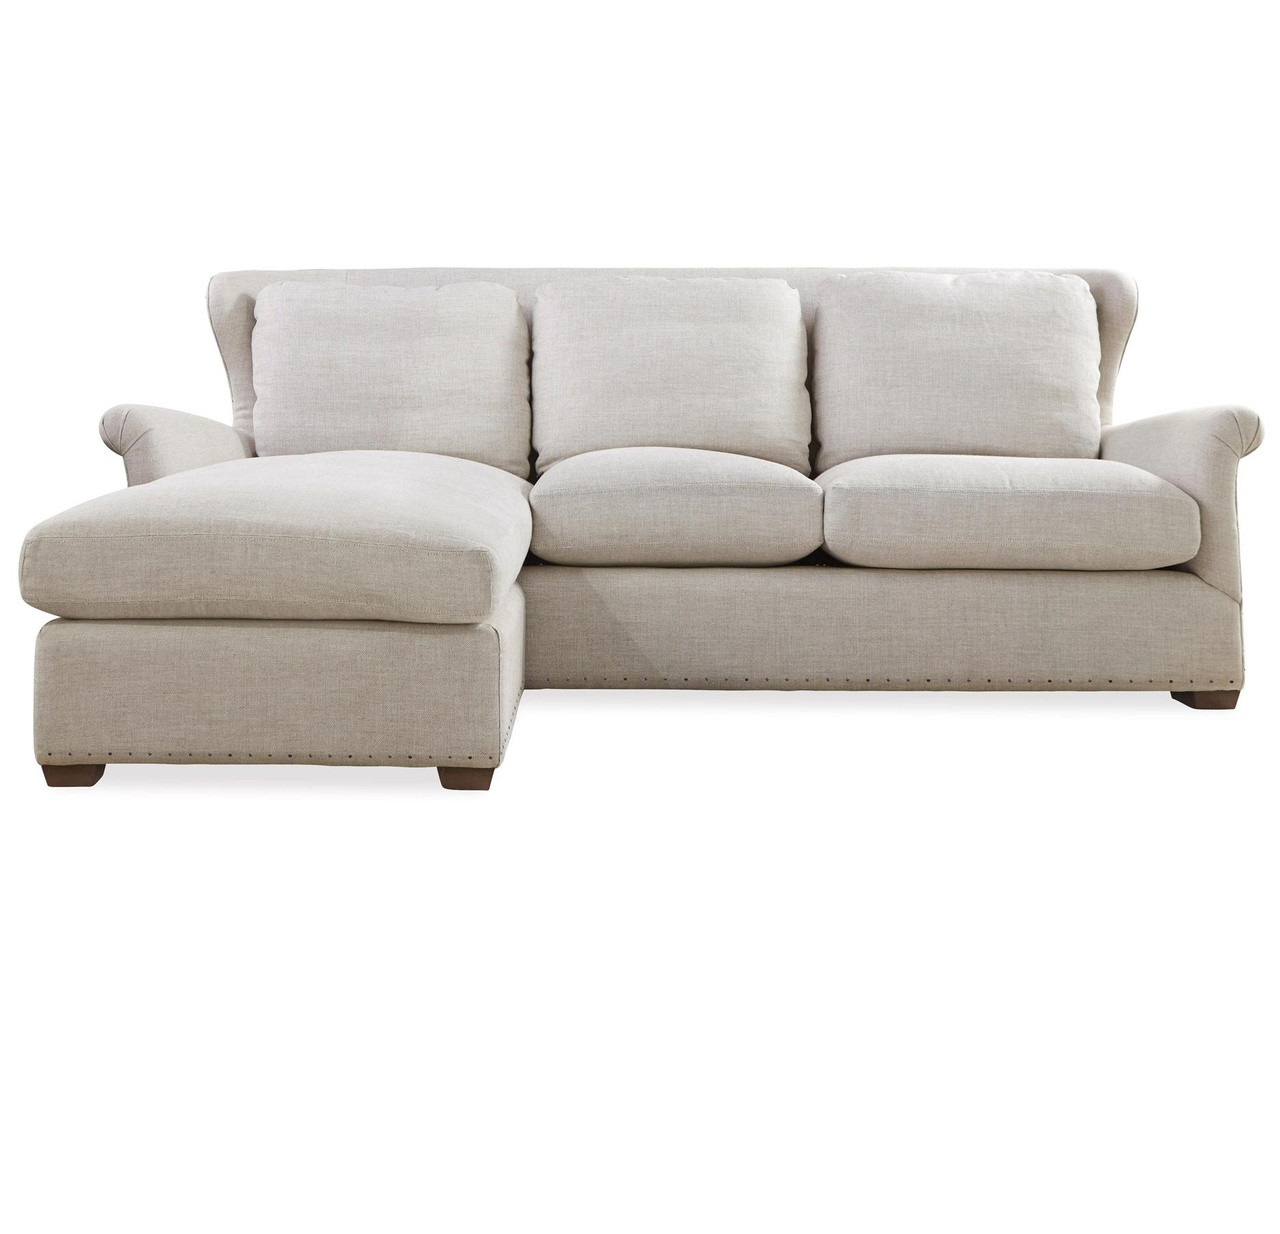 Haven Belgian Linen Upholstered Wingback Sectional Sofa | Zin Home